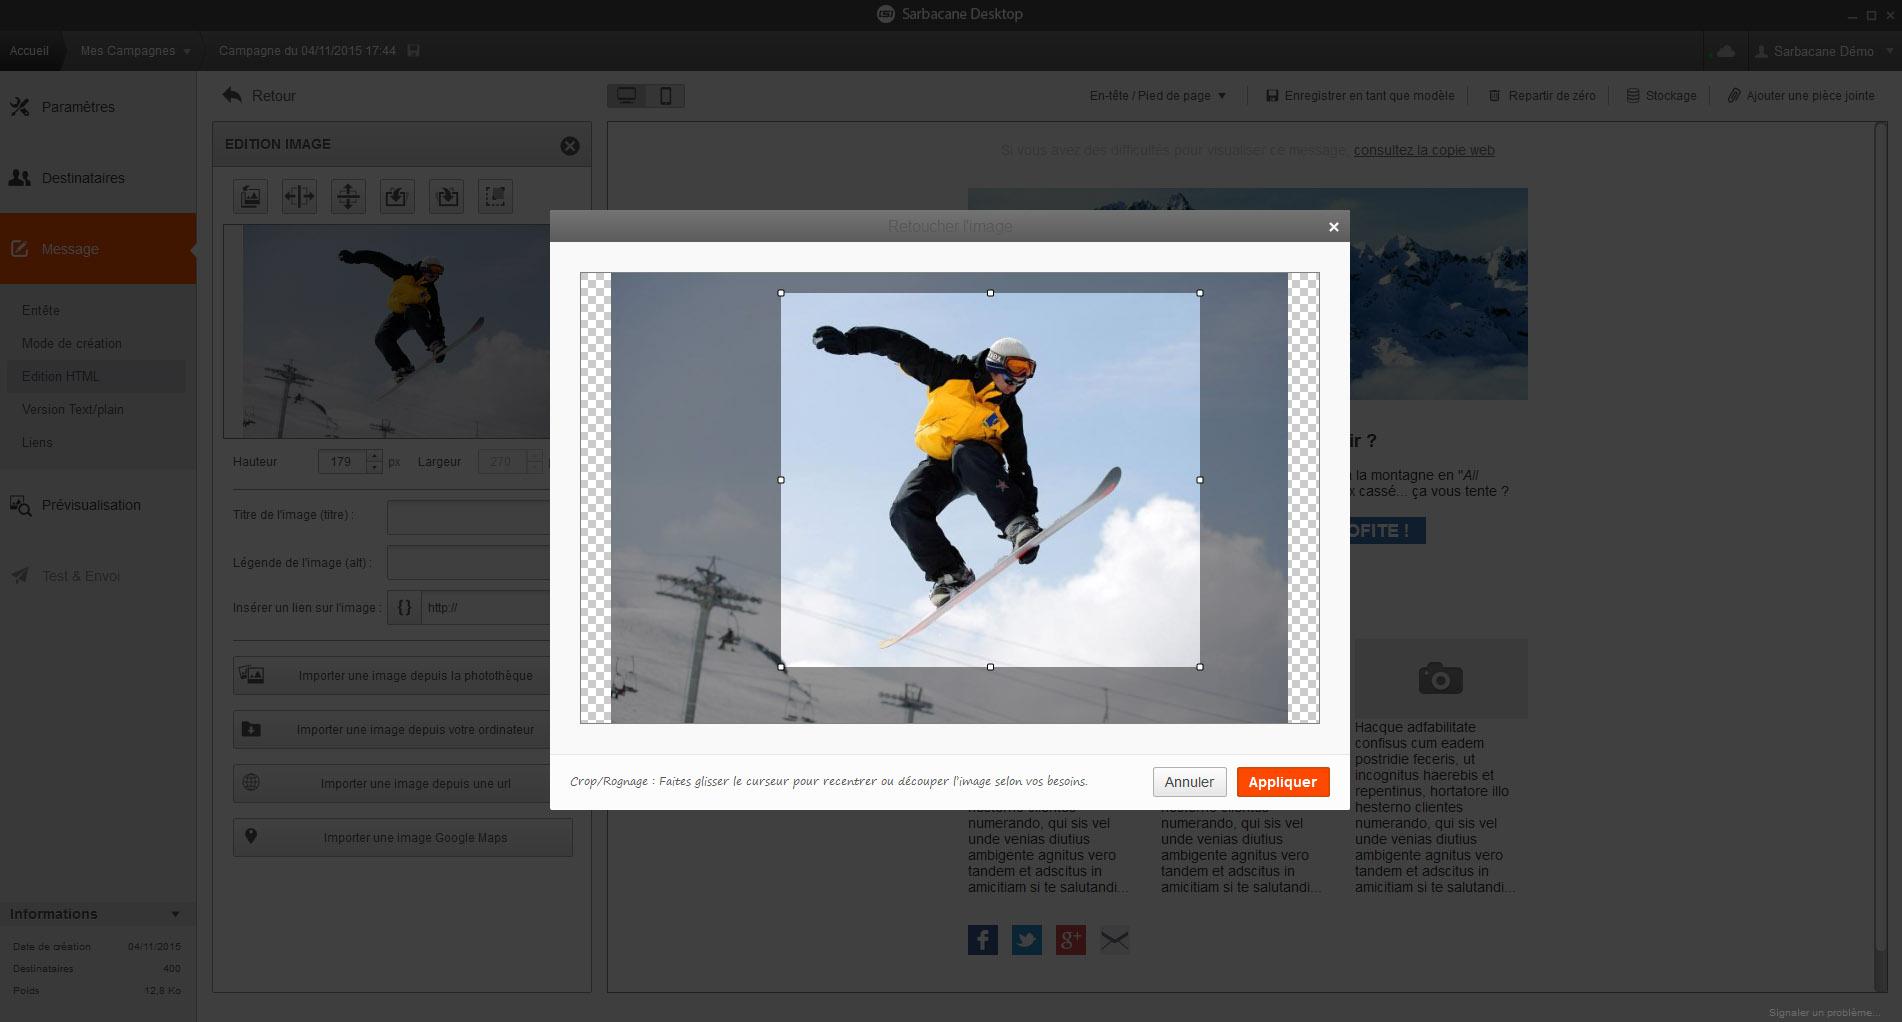 Emailbuilder edition Image - Sarbacane